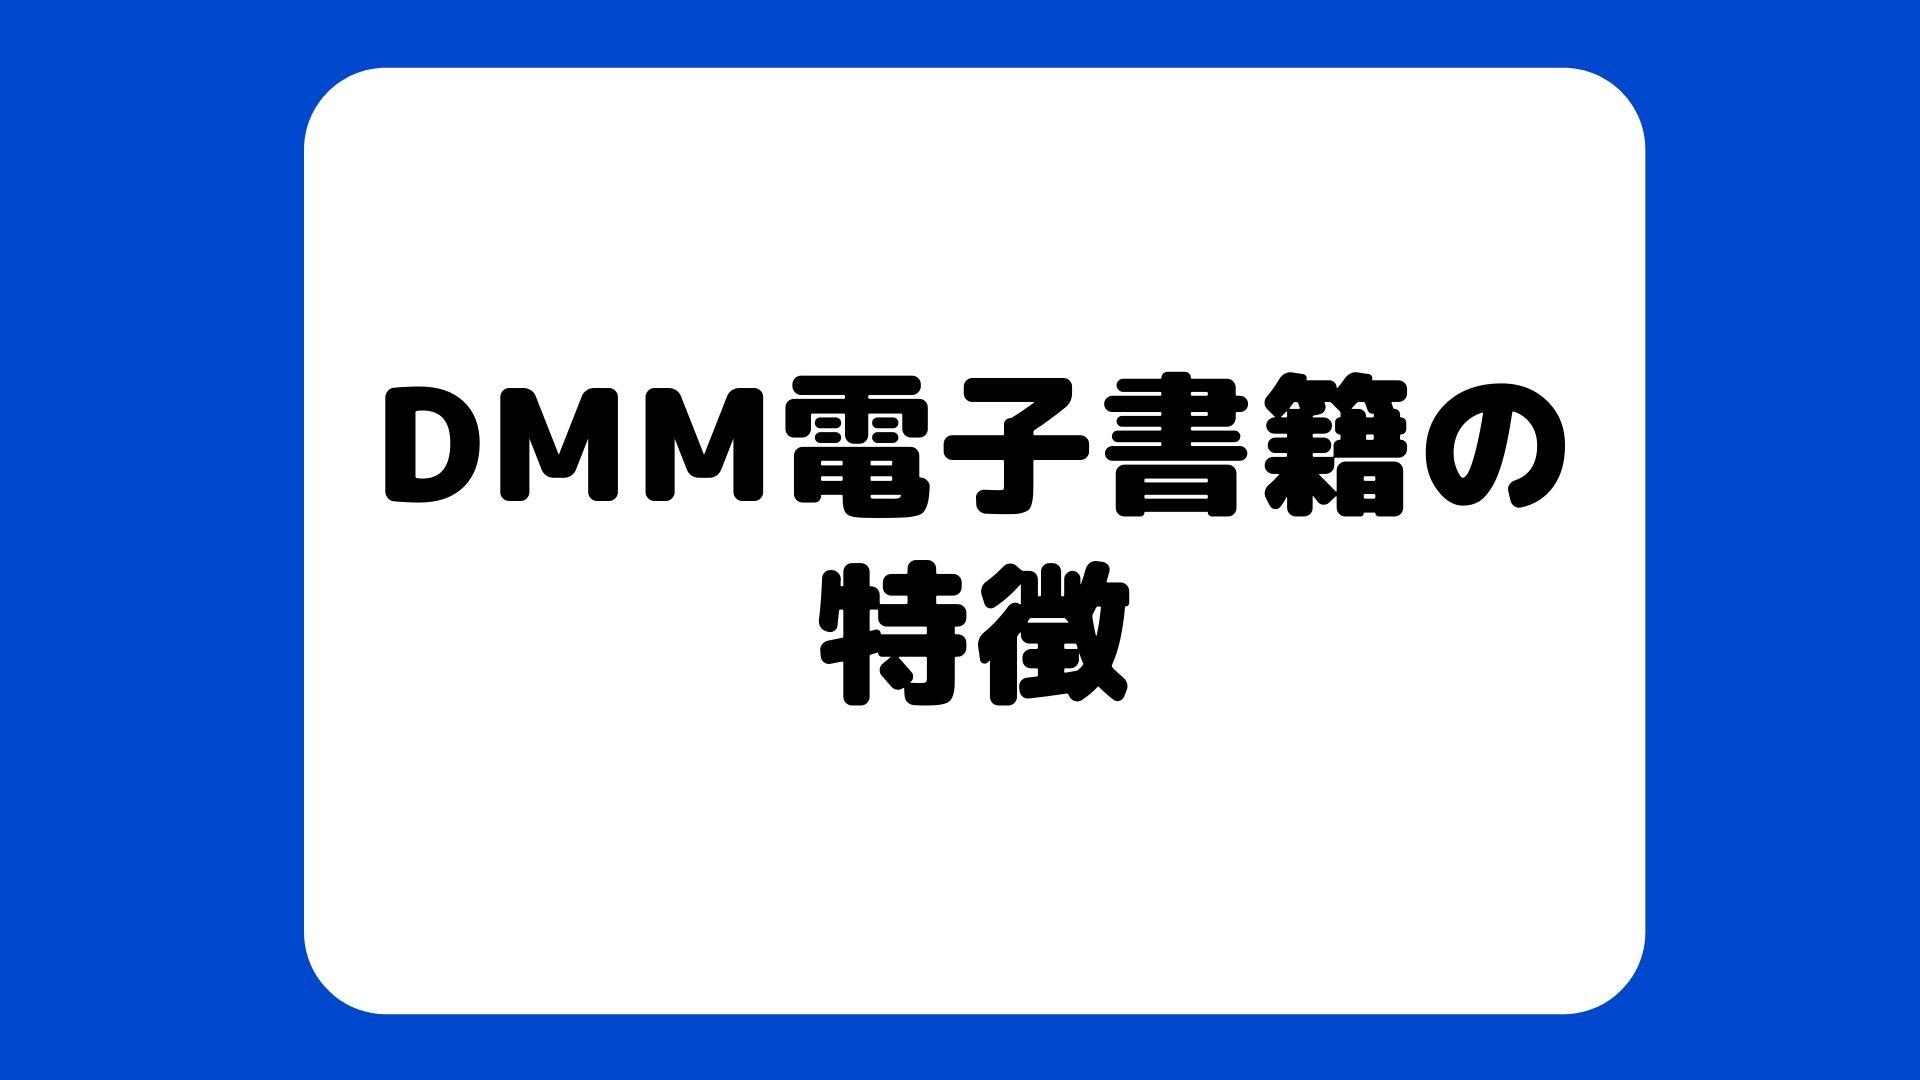 DMM電子書籍の特徴